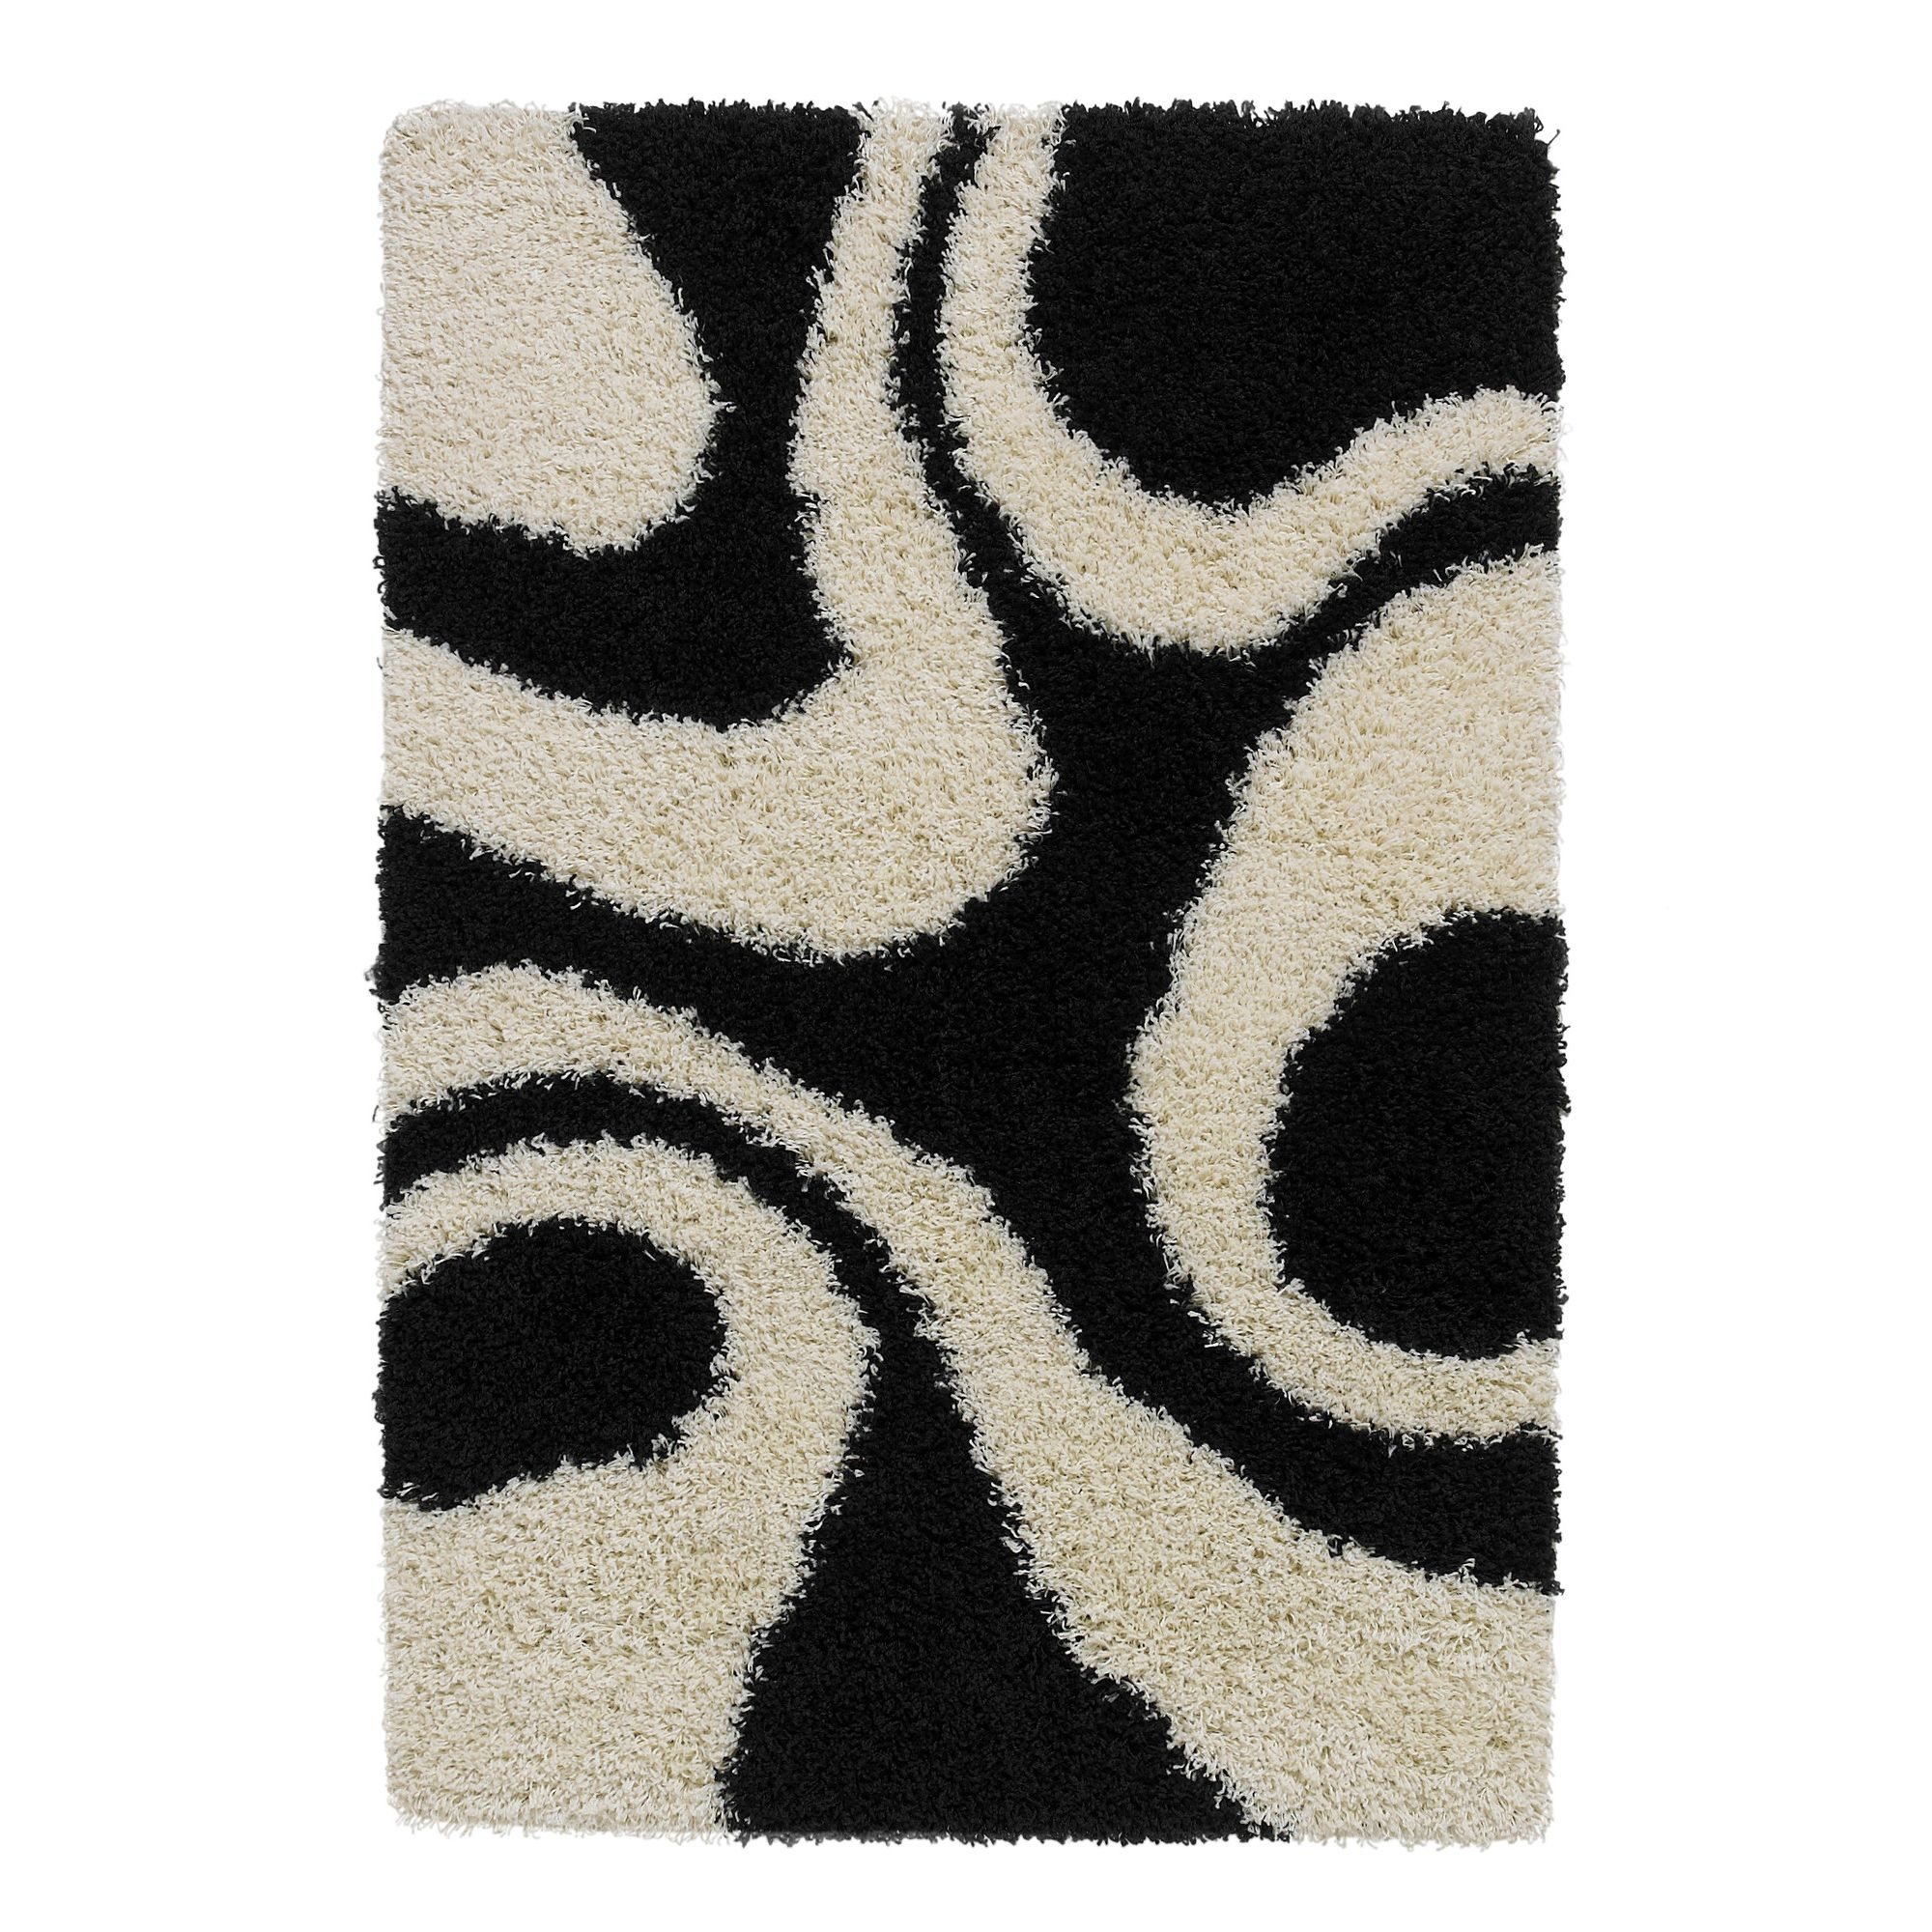 Oriental Carpets & Rugs Vista Black/White Rug - 170cm L x 120cm W